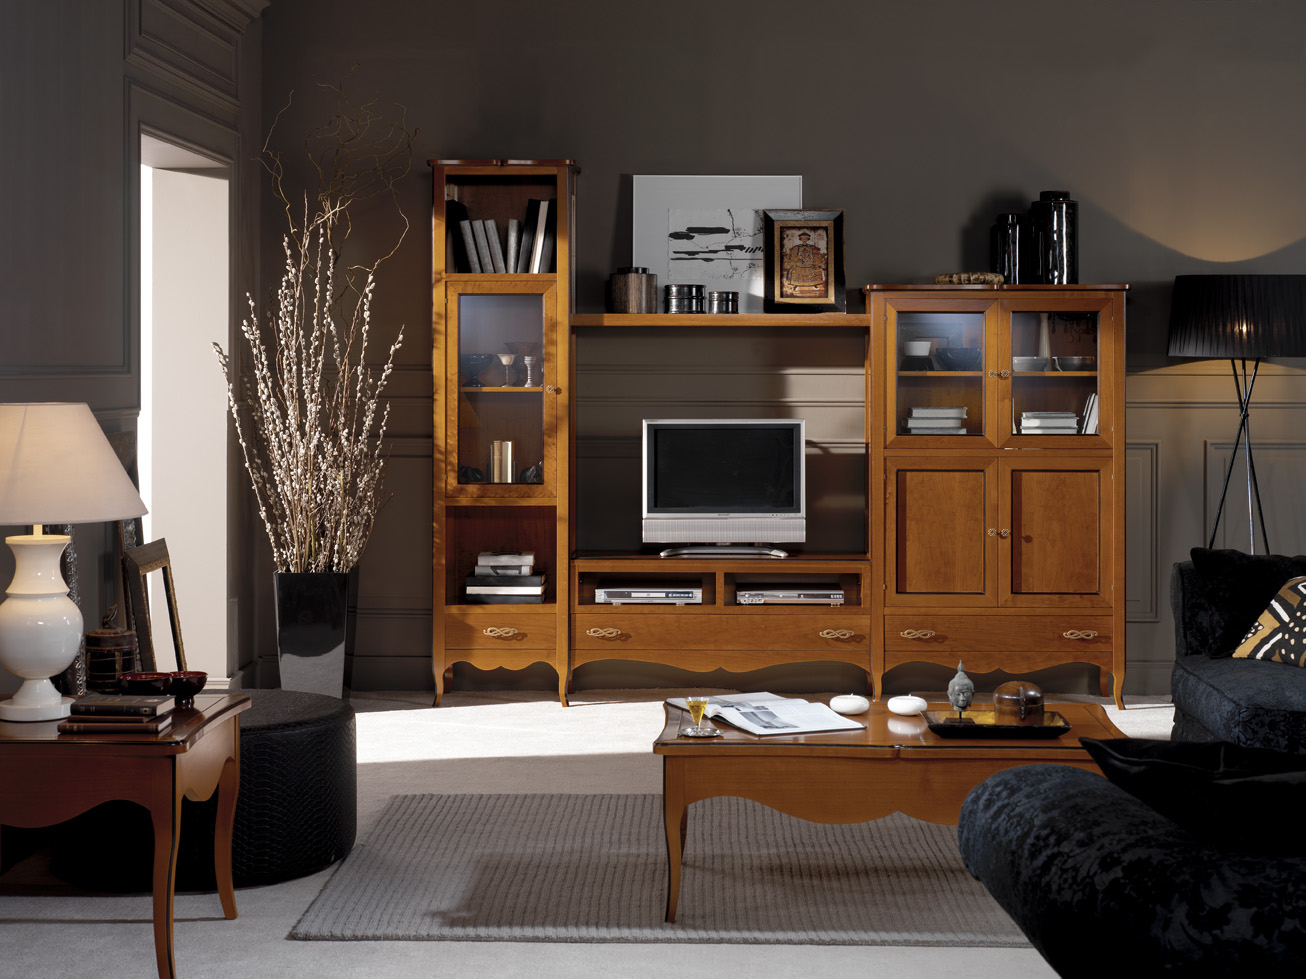 Muebles oleana carla - Decoracion para muebles de salon ...